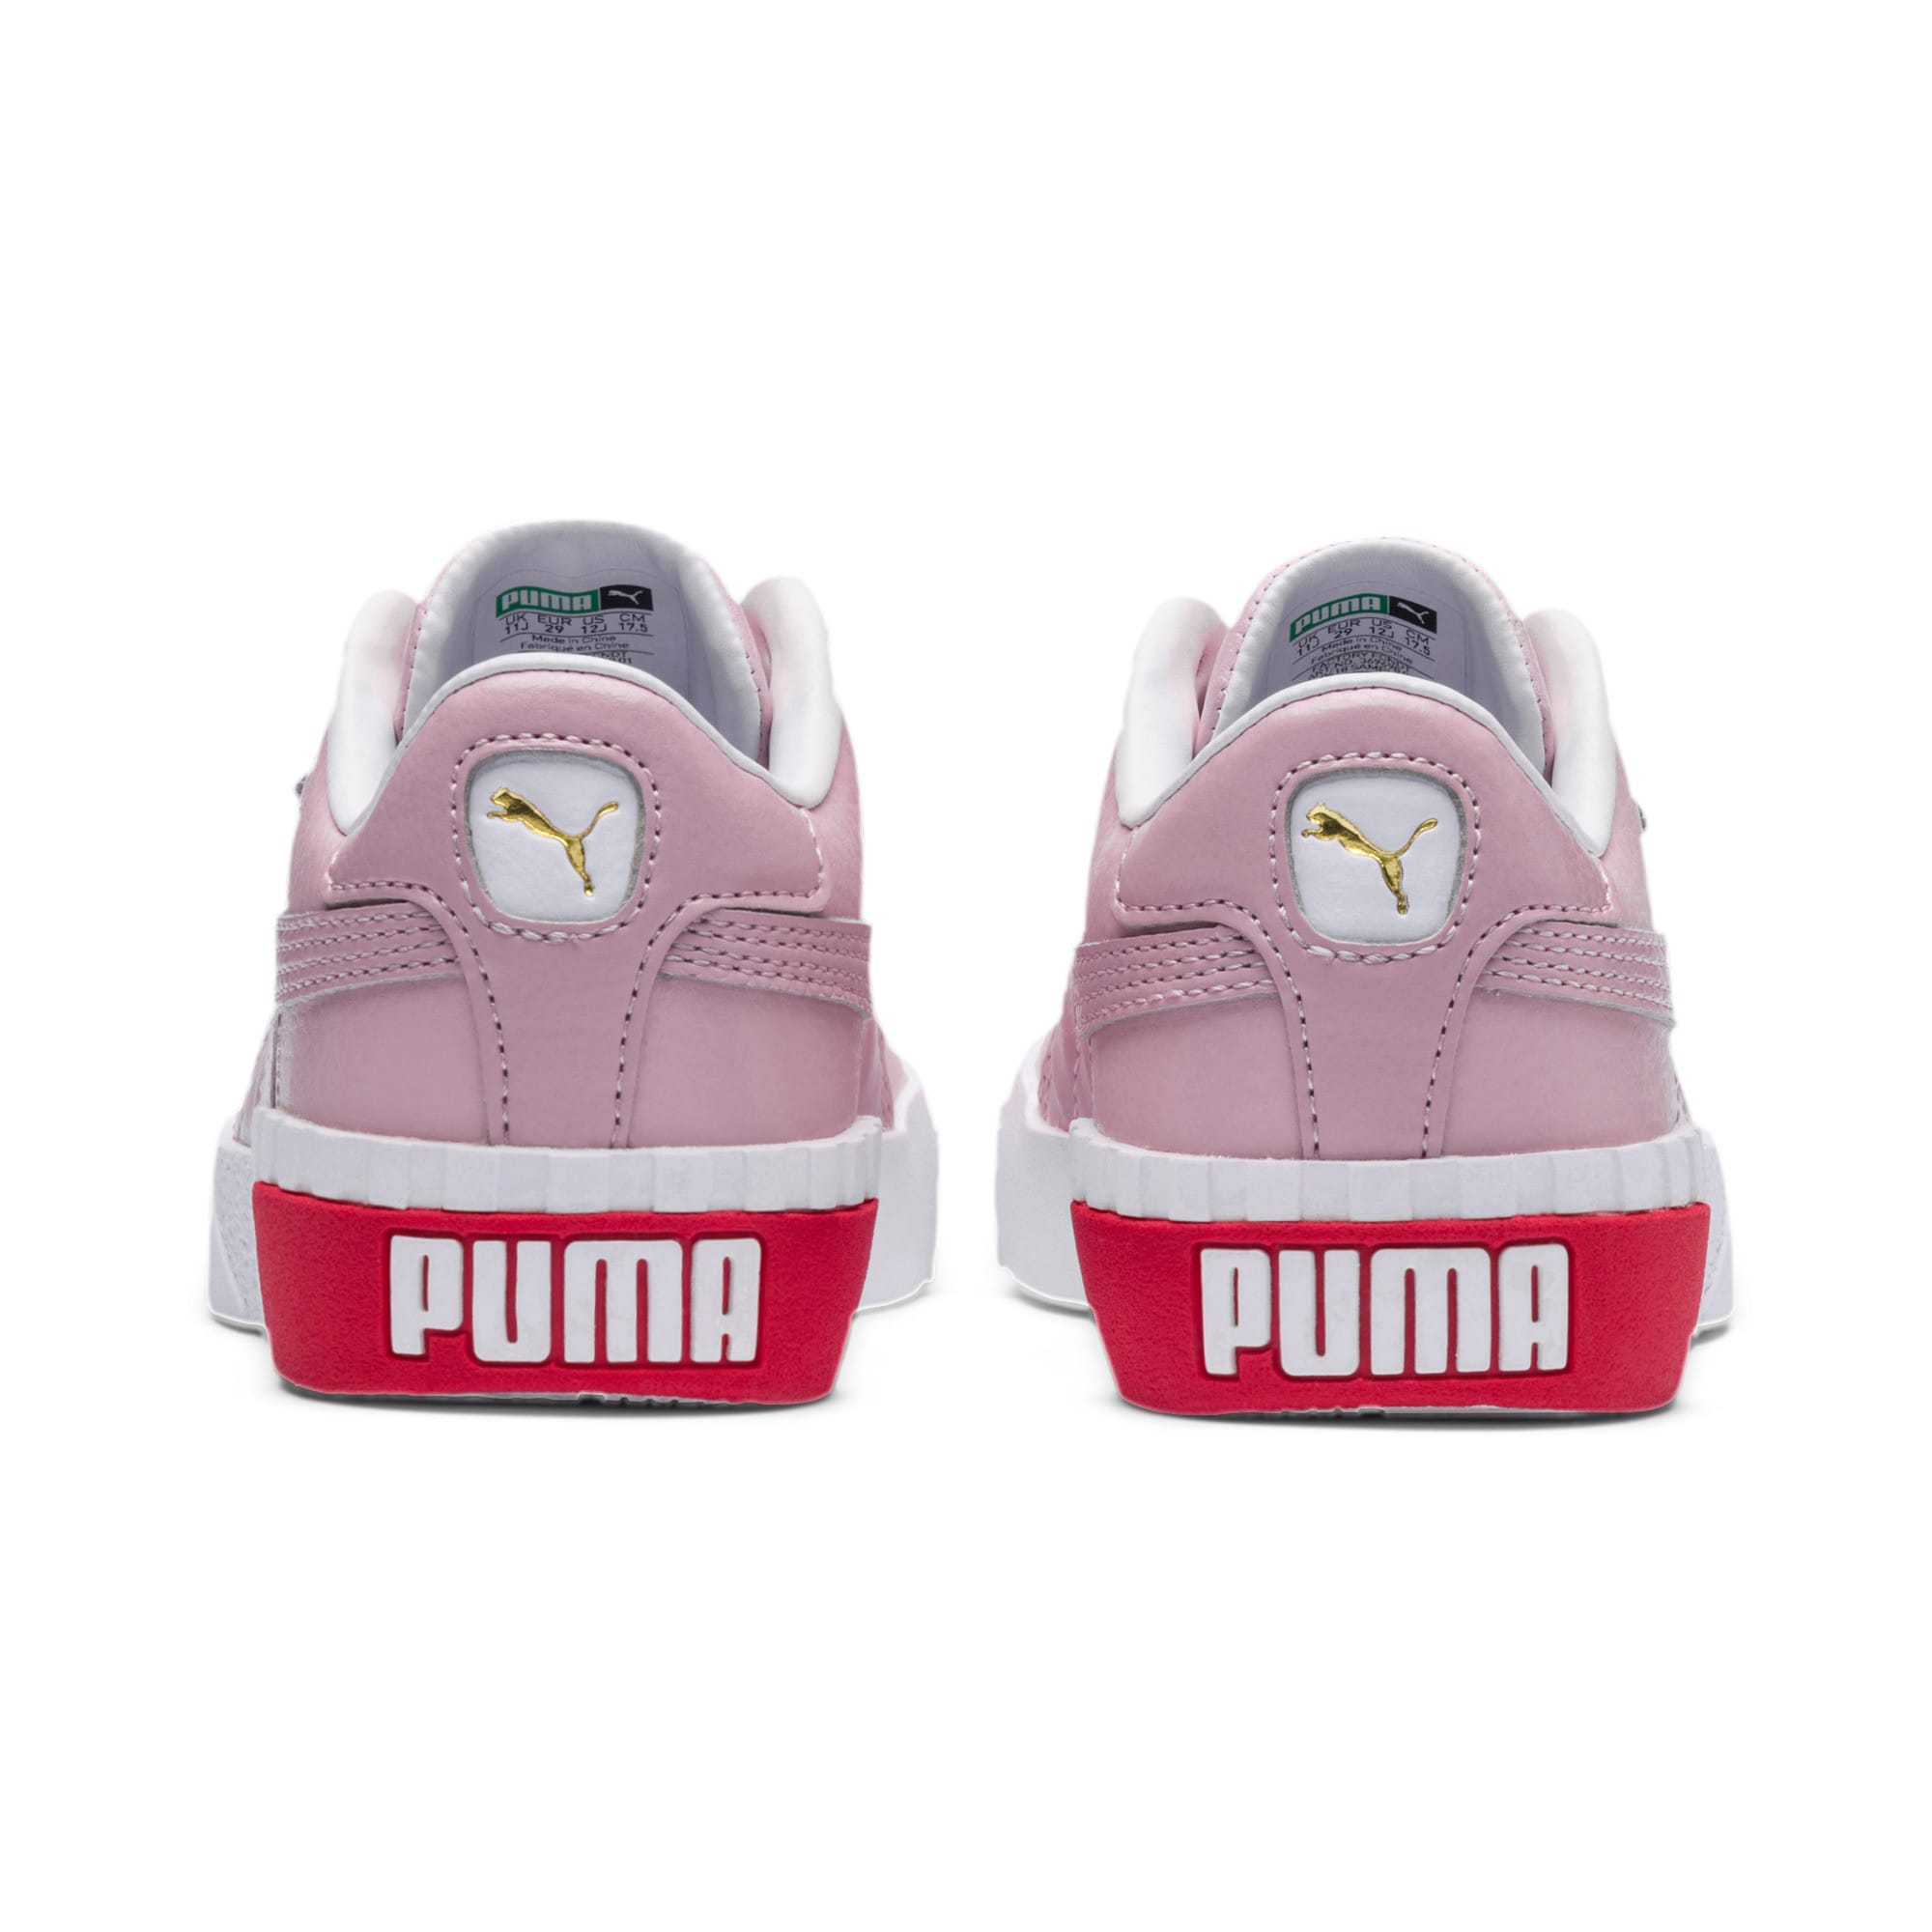 Thumbnail 3 of Cali Little Kids' Shoes, Puma White-Hibiscus, medium